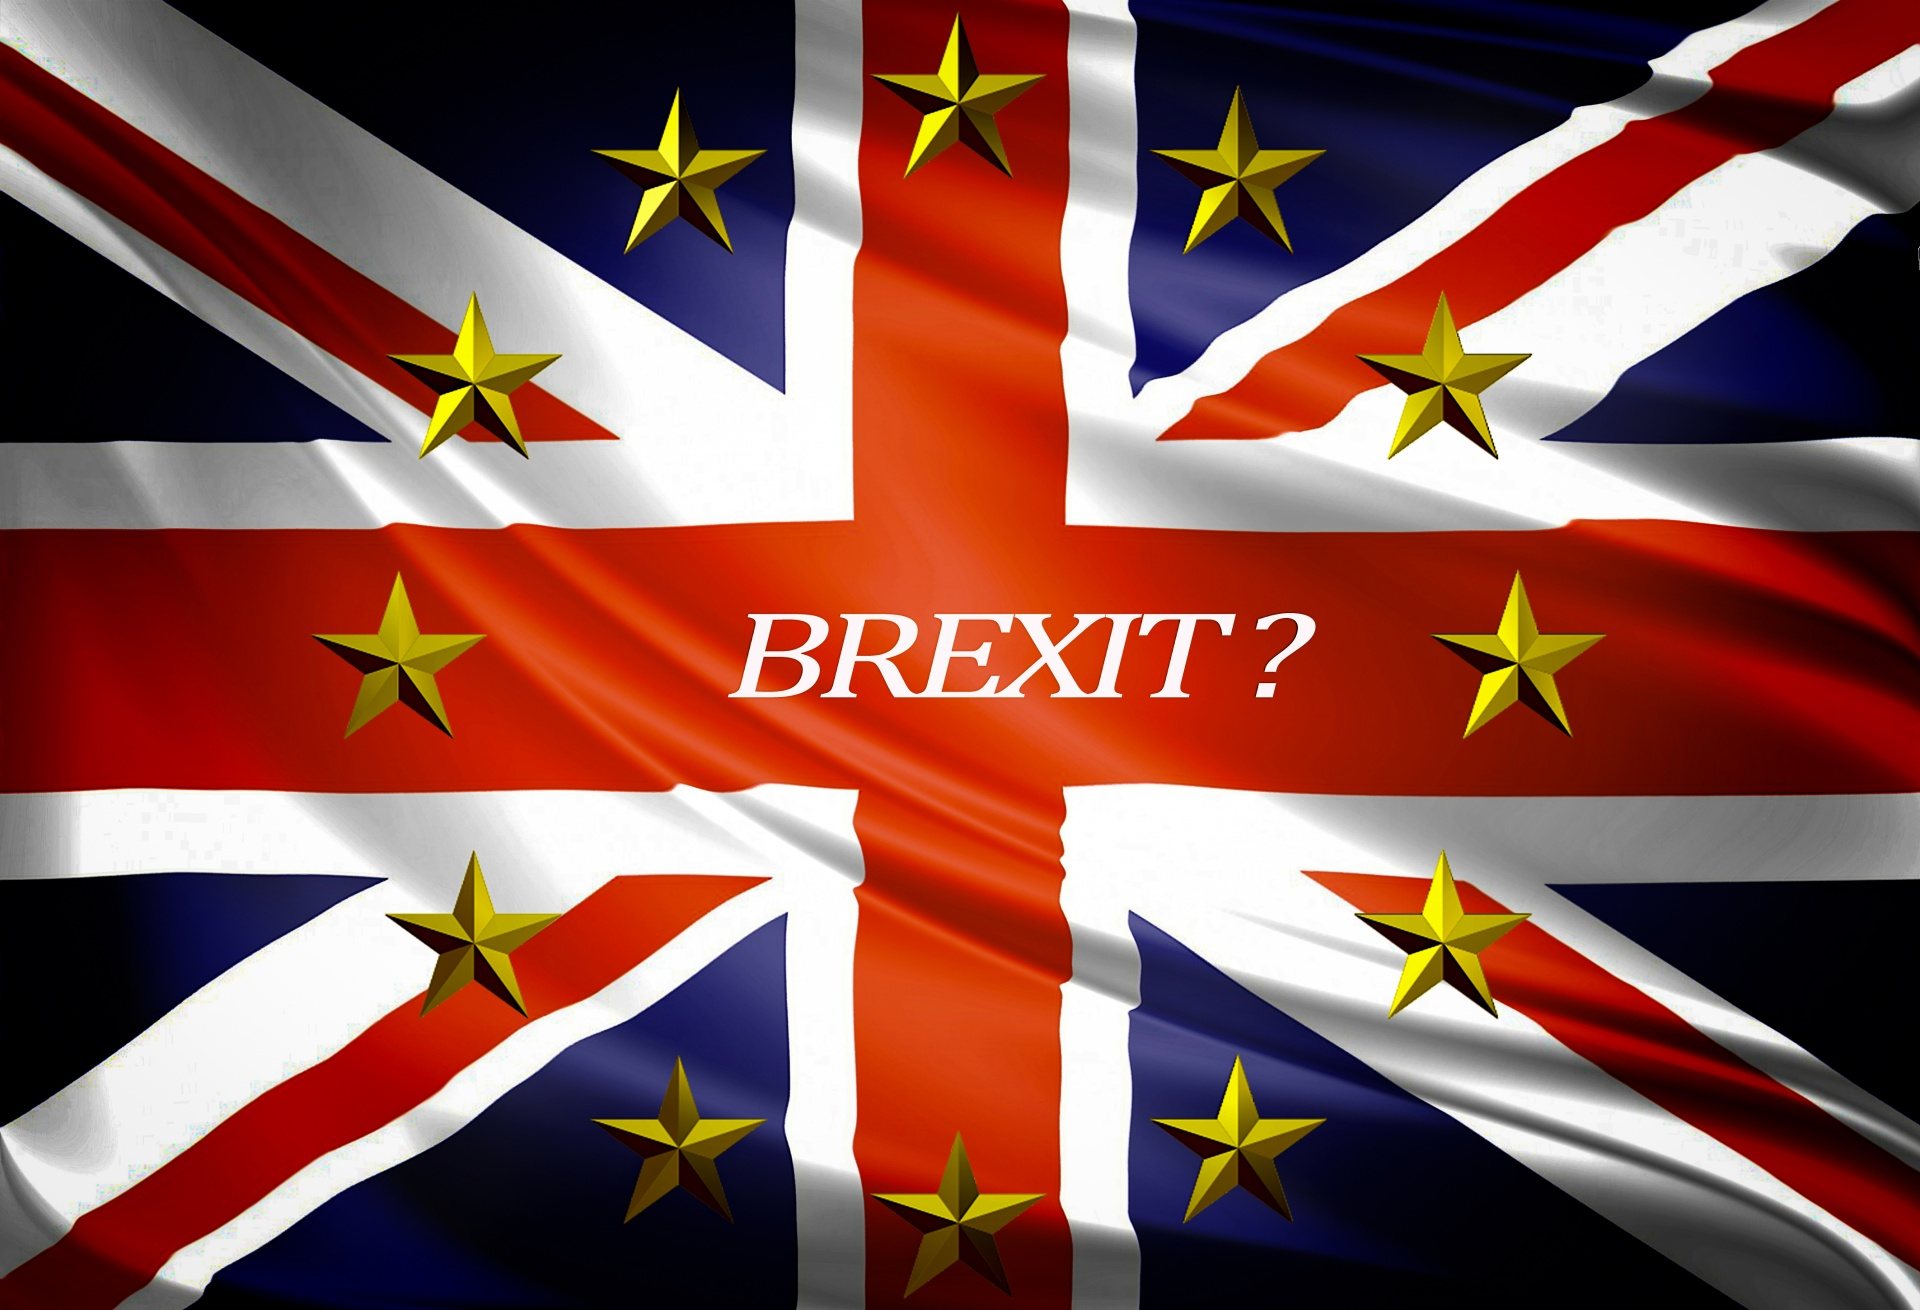 Проект по Brexit согласовали ЕС и Великобритания